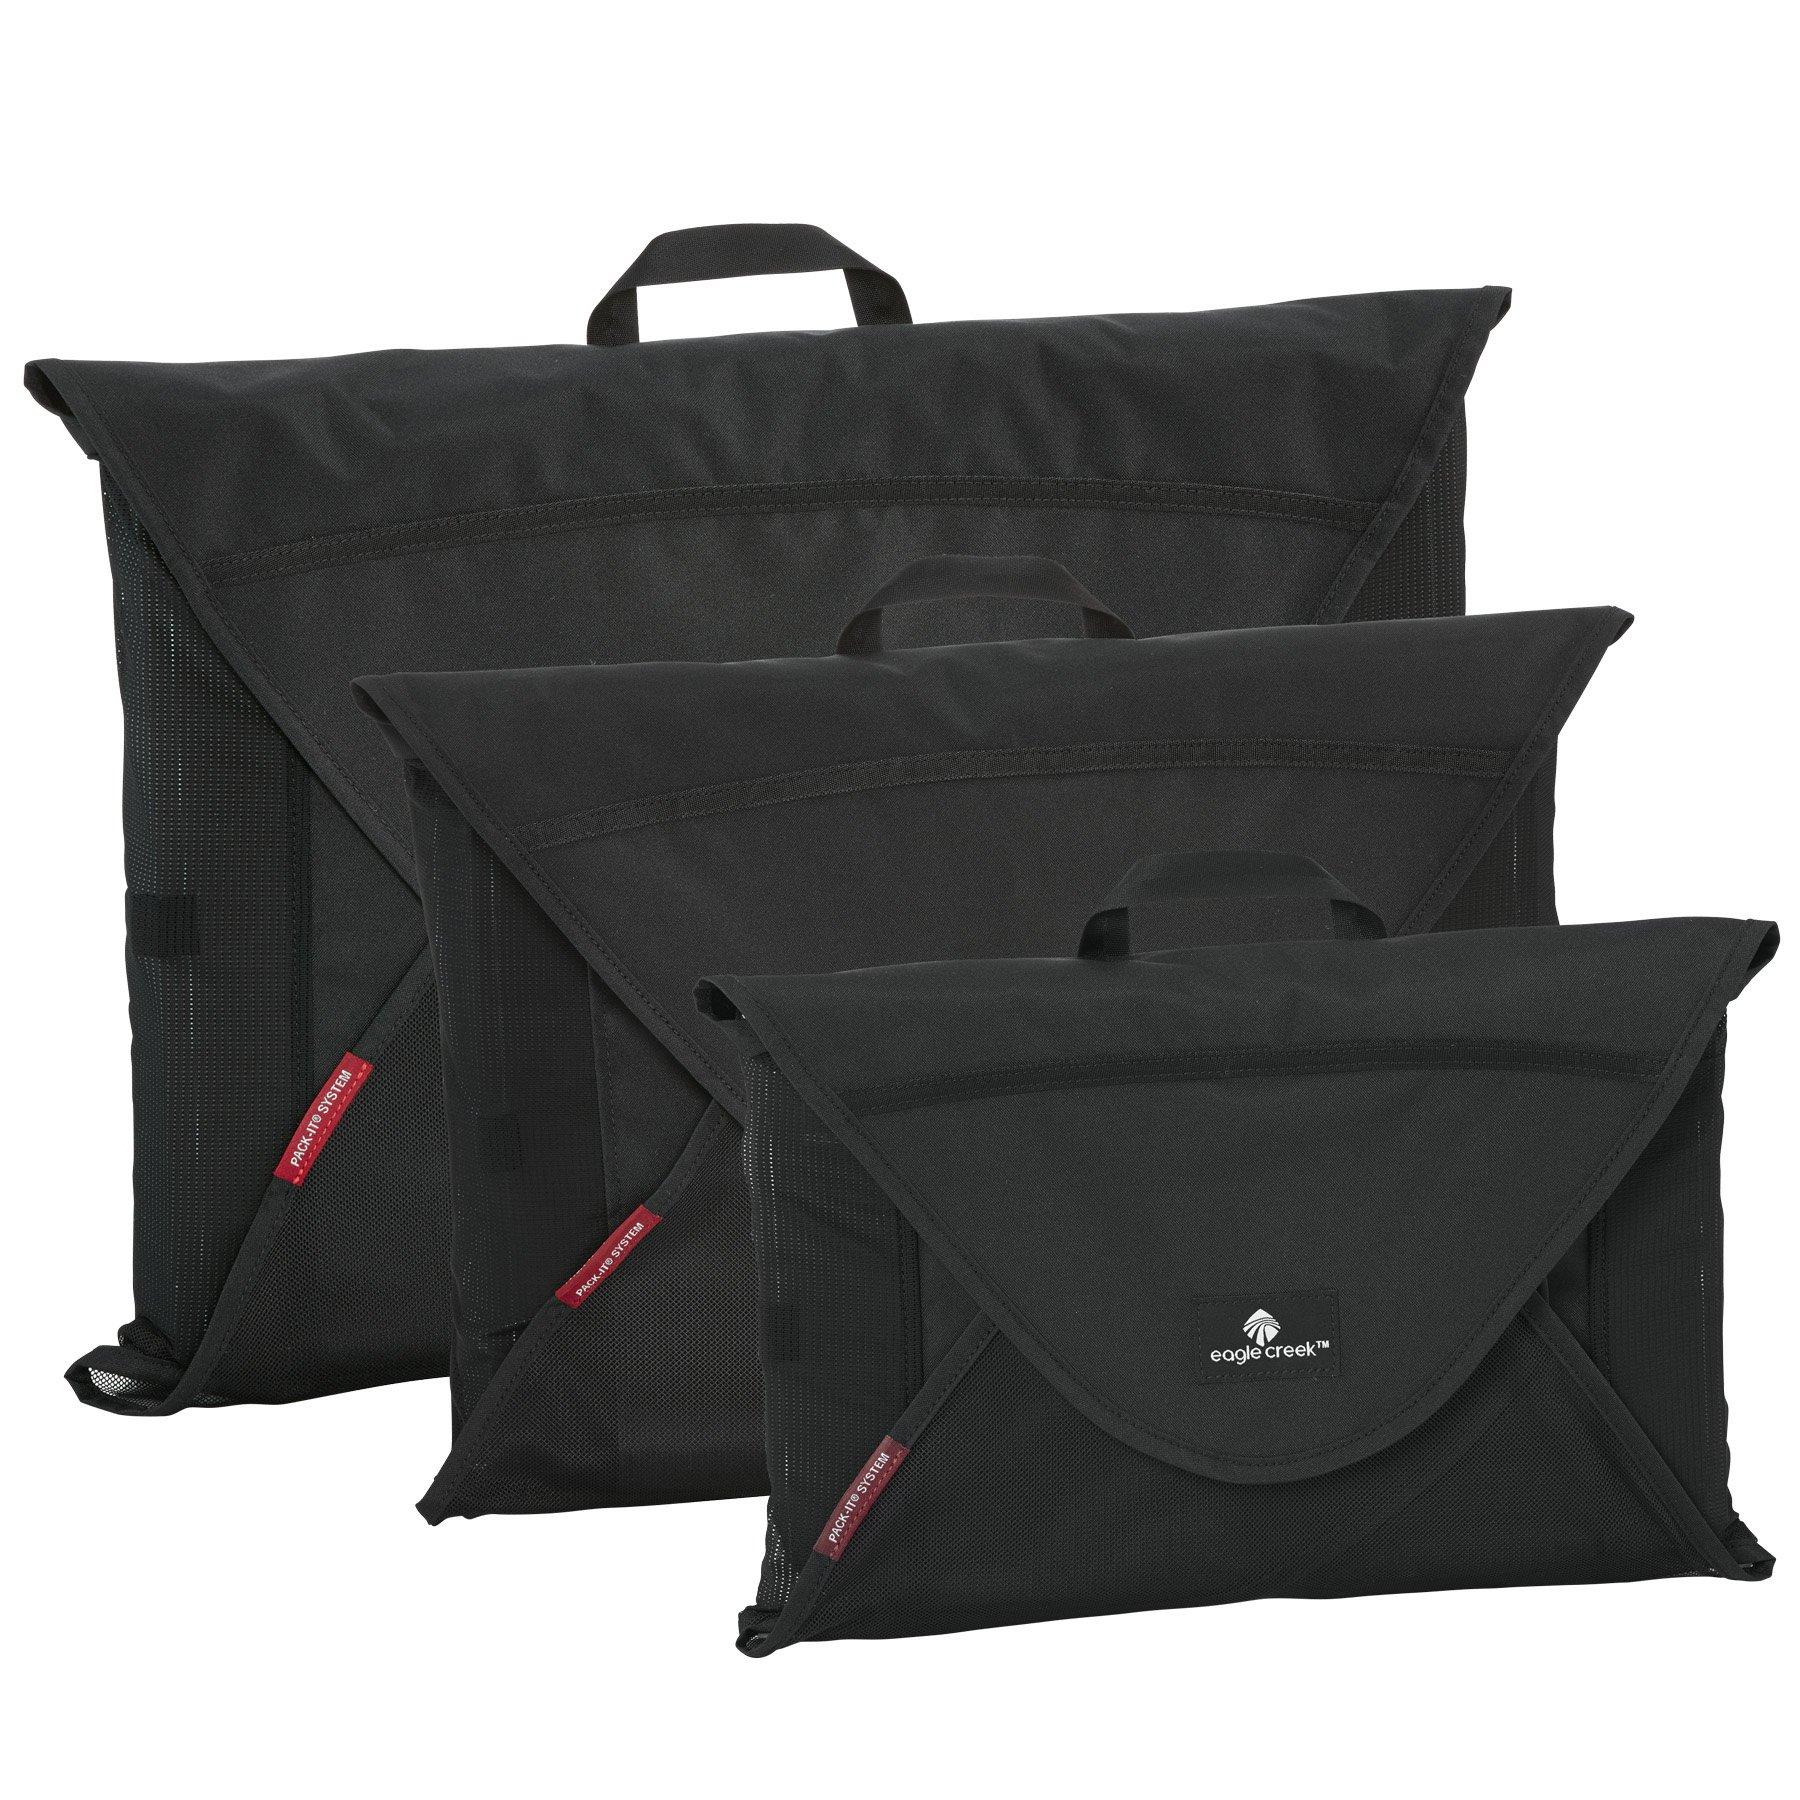 Eagle Creek Pack-It Original Garment Folder Set, Black, Set of 3 (S, M, L) by Eagle Creek